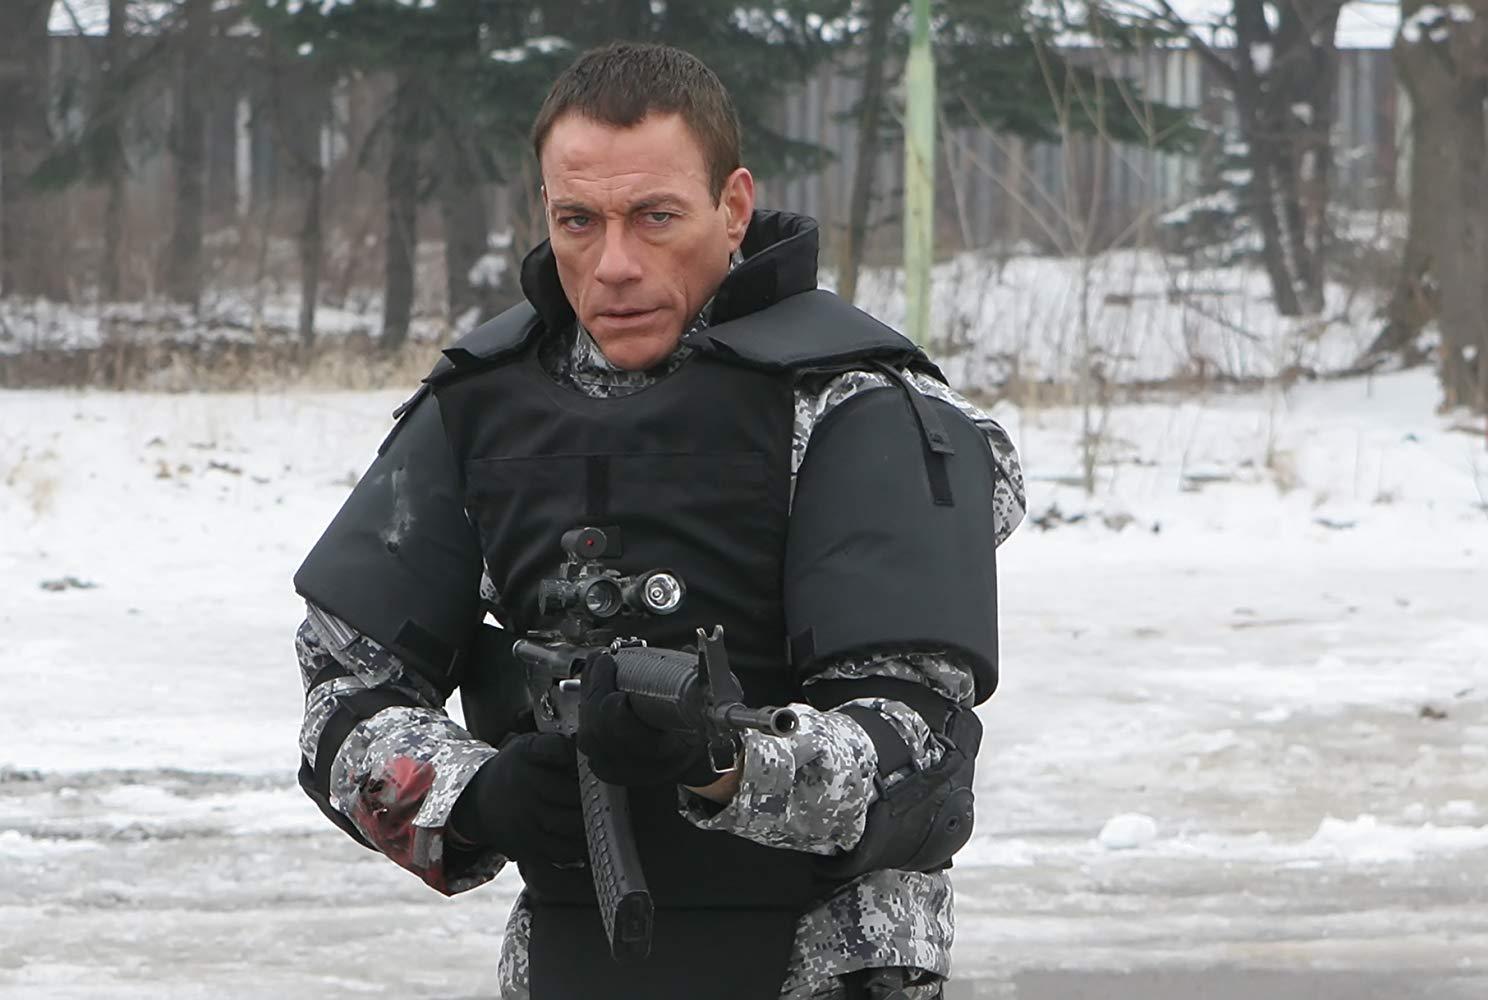 Luc Devereaux (Jean-Claude Van Damme) in Universal Soldier: Regeneration (2009)